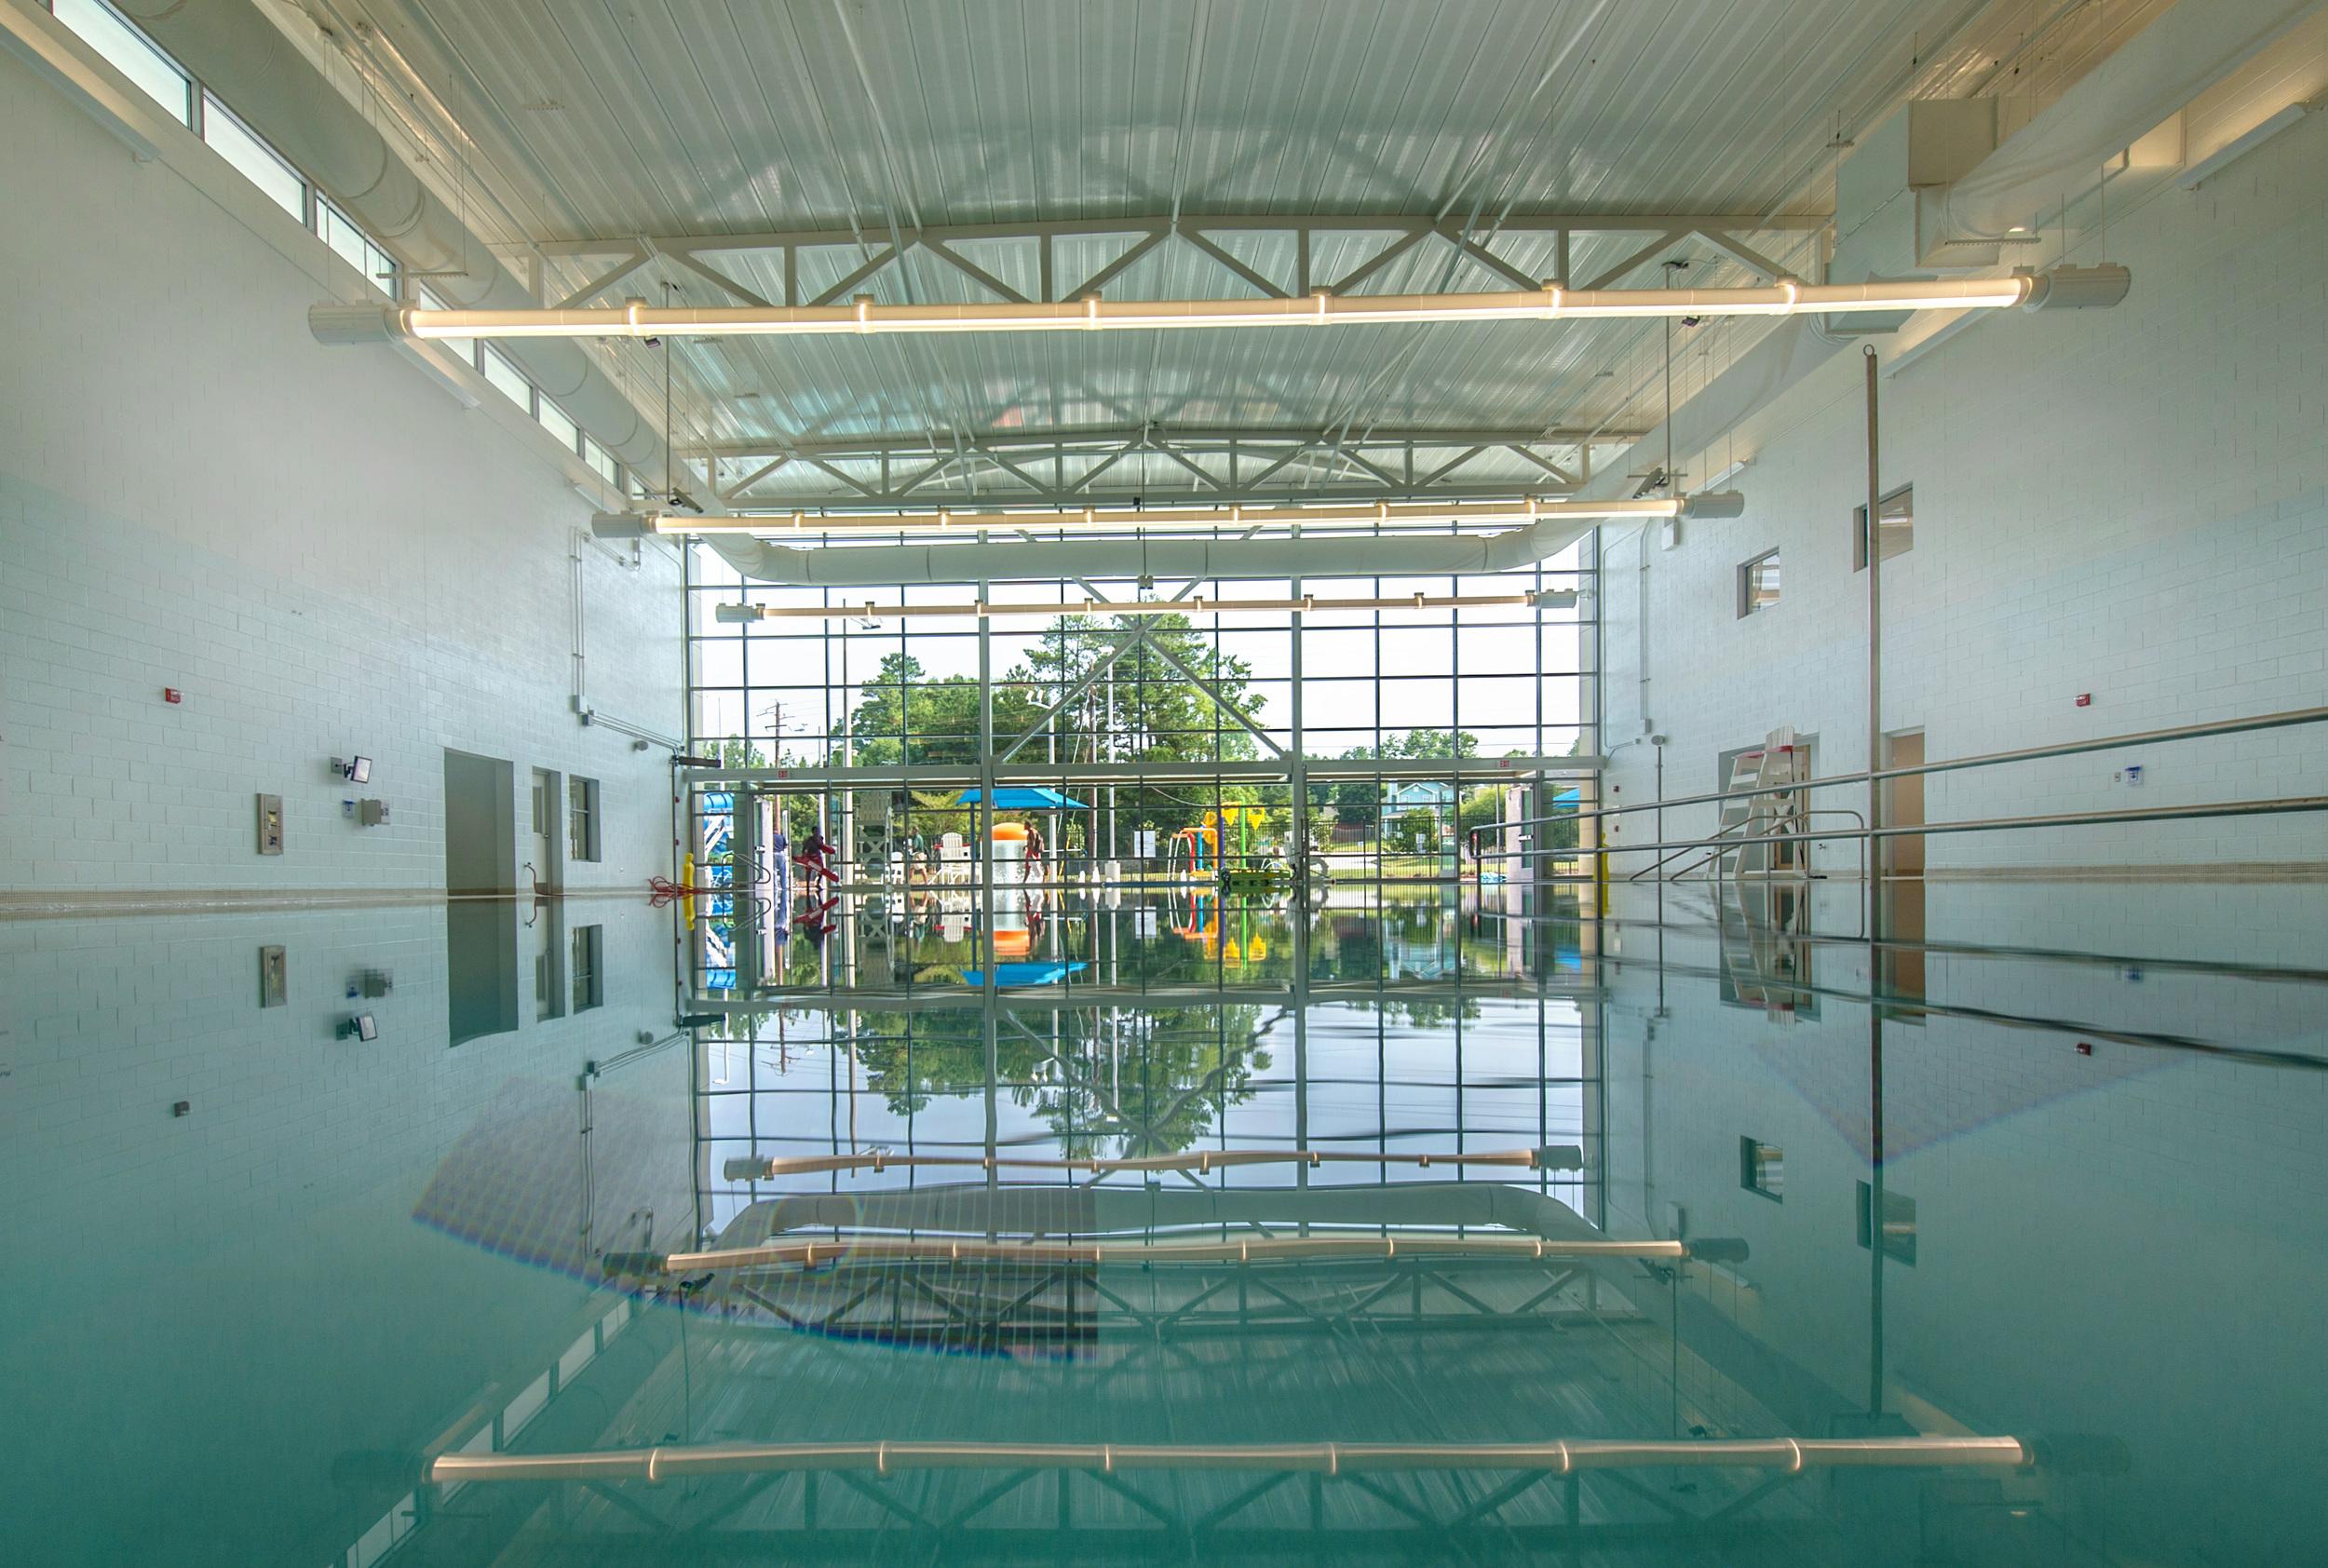 Pool Interior 3.jpg